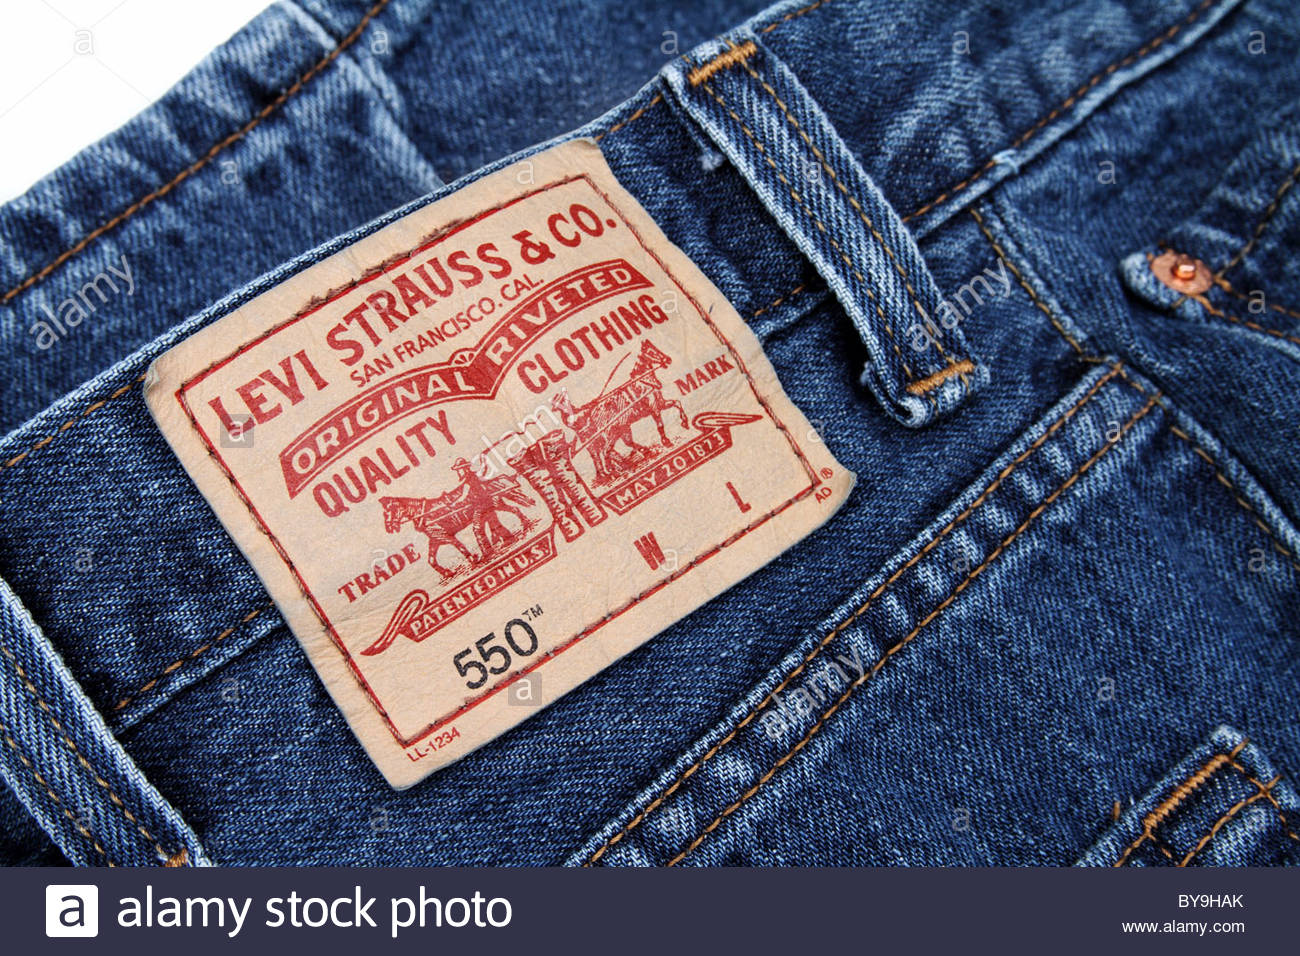 jeans levis strauss